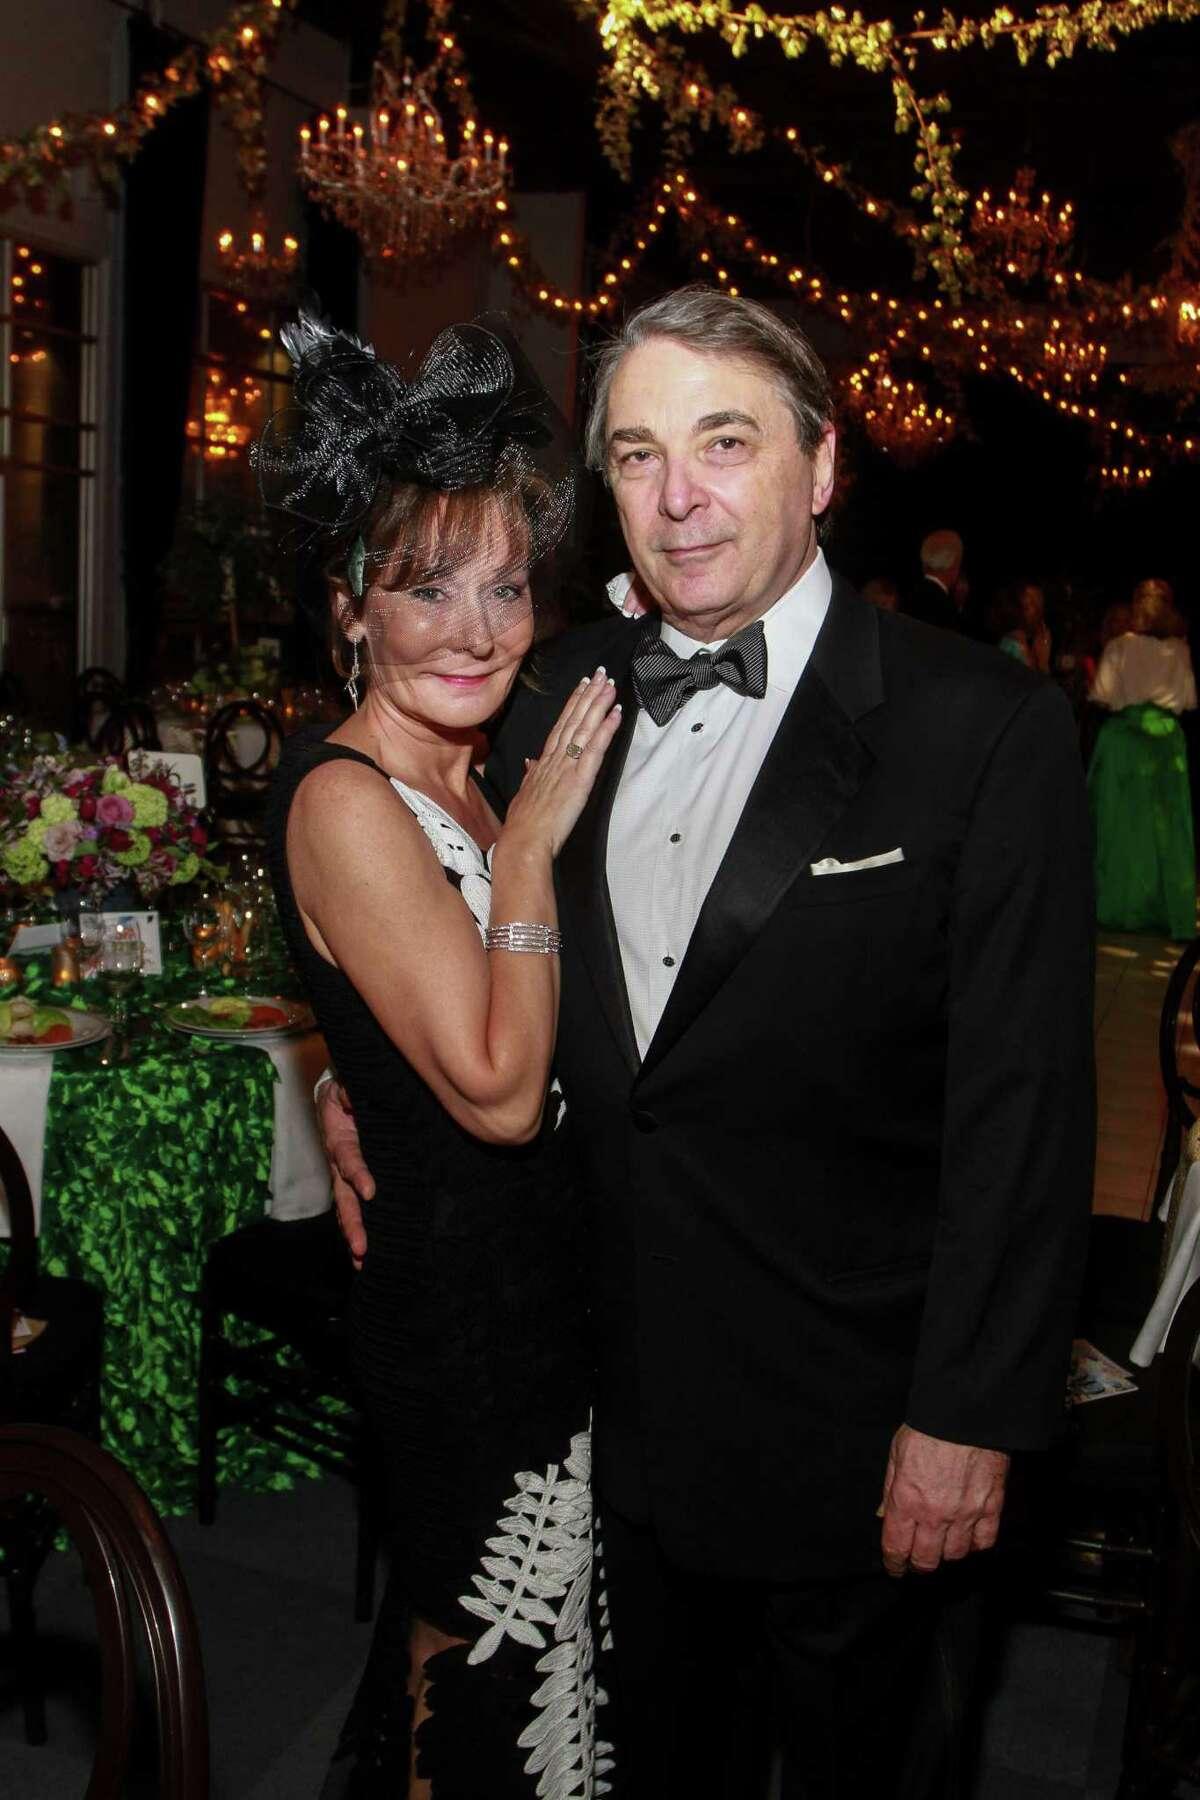 Melanie Gray and Mark Wawro at the Society for the Performing Arts Gala.